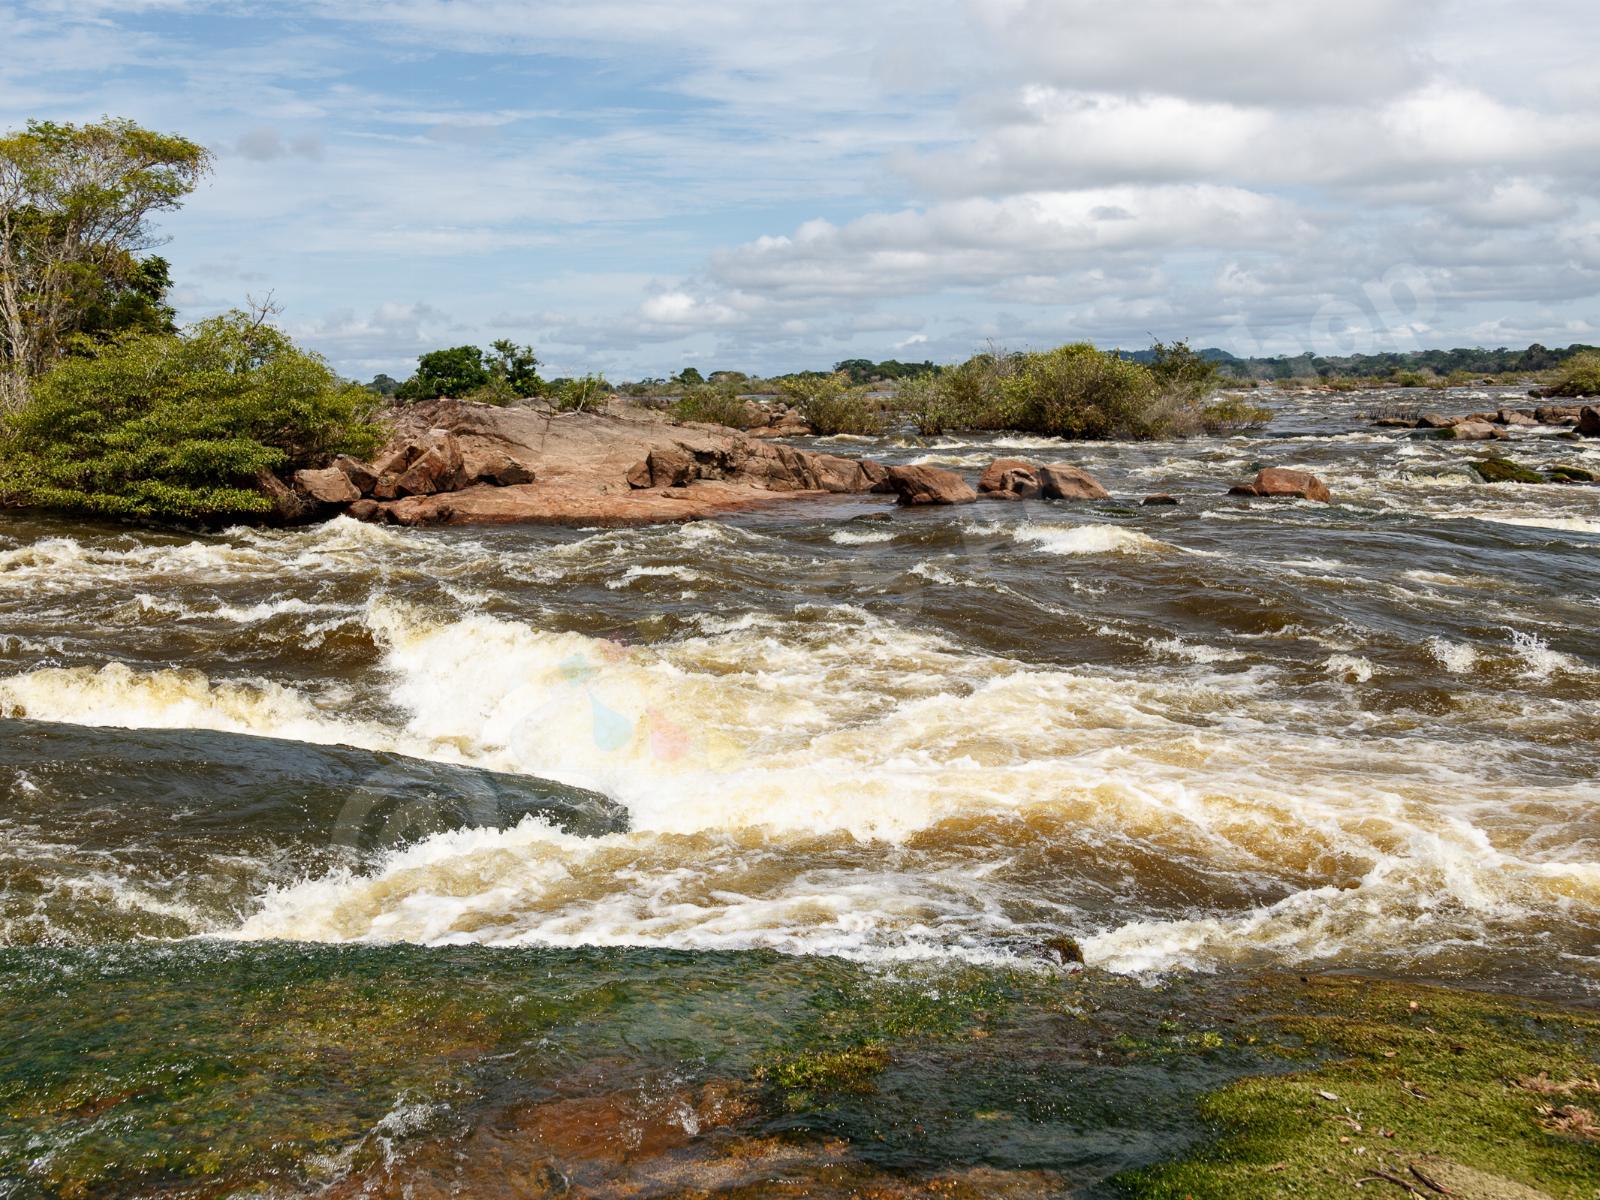 rio iriri  cachoeira grande  andreas tanke 0201 6